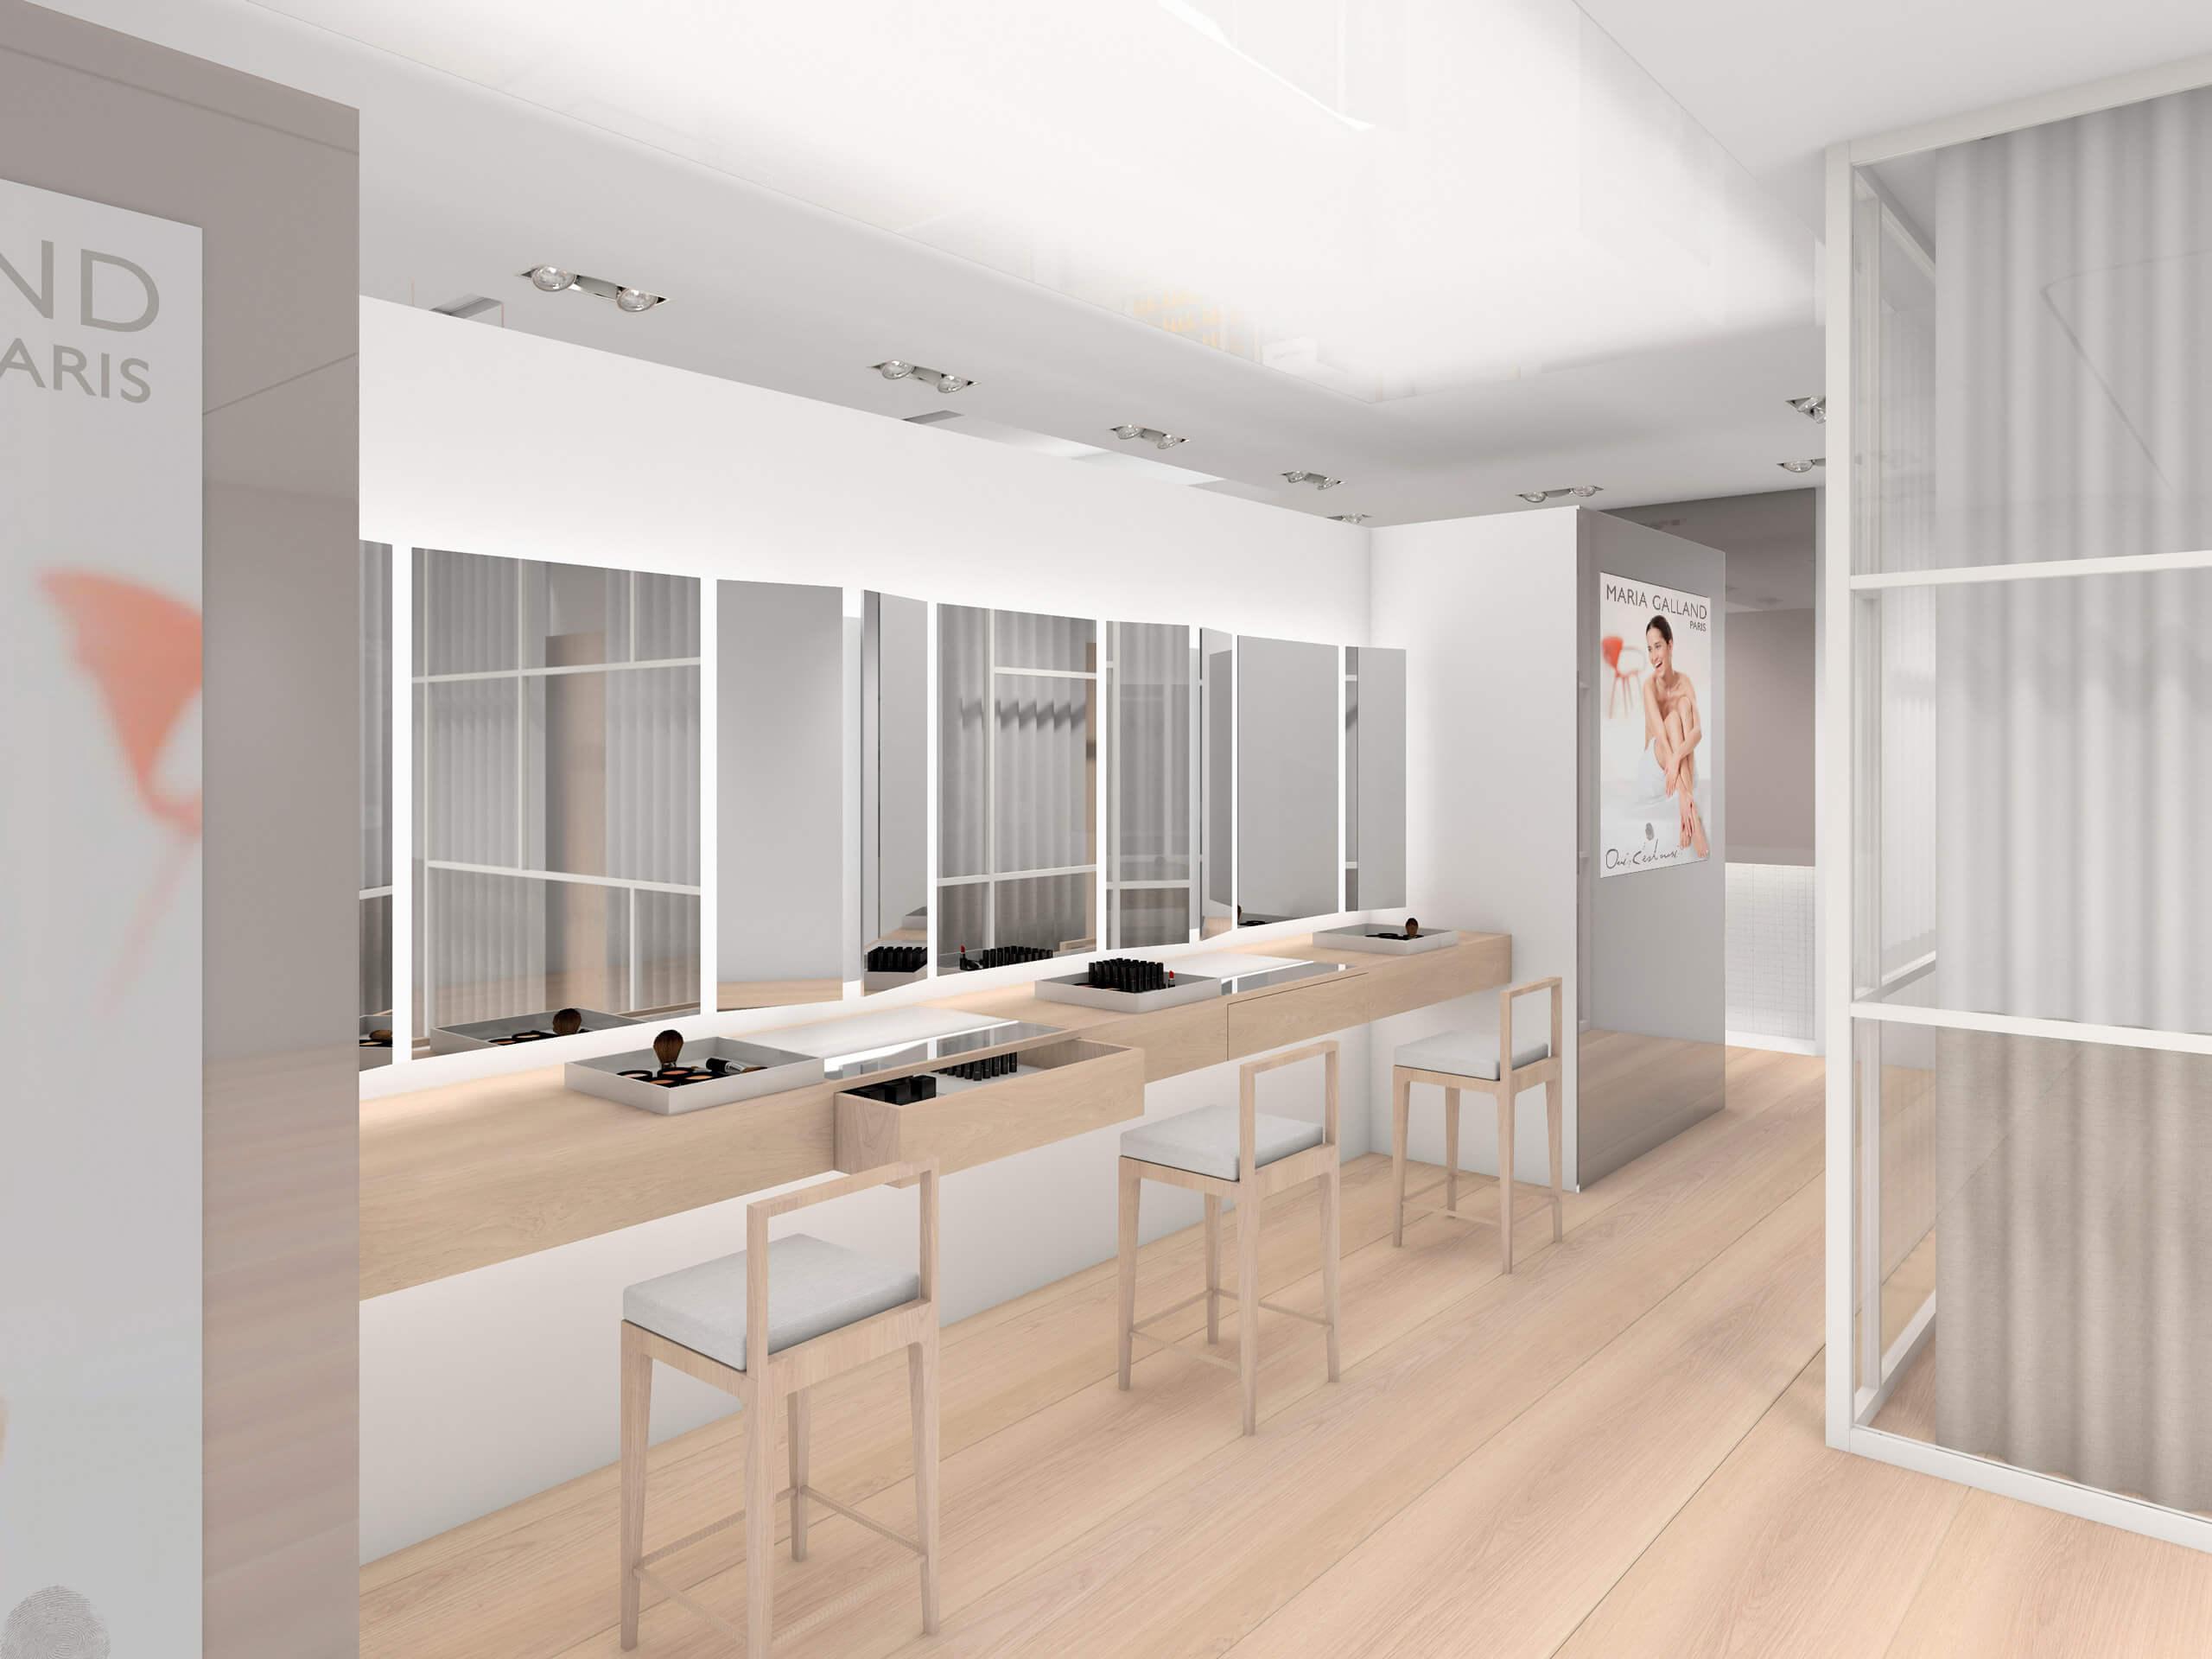 maria-galland-shop-concept-6